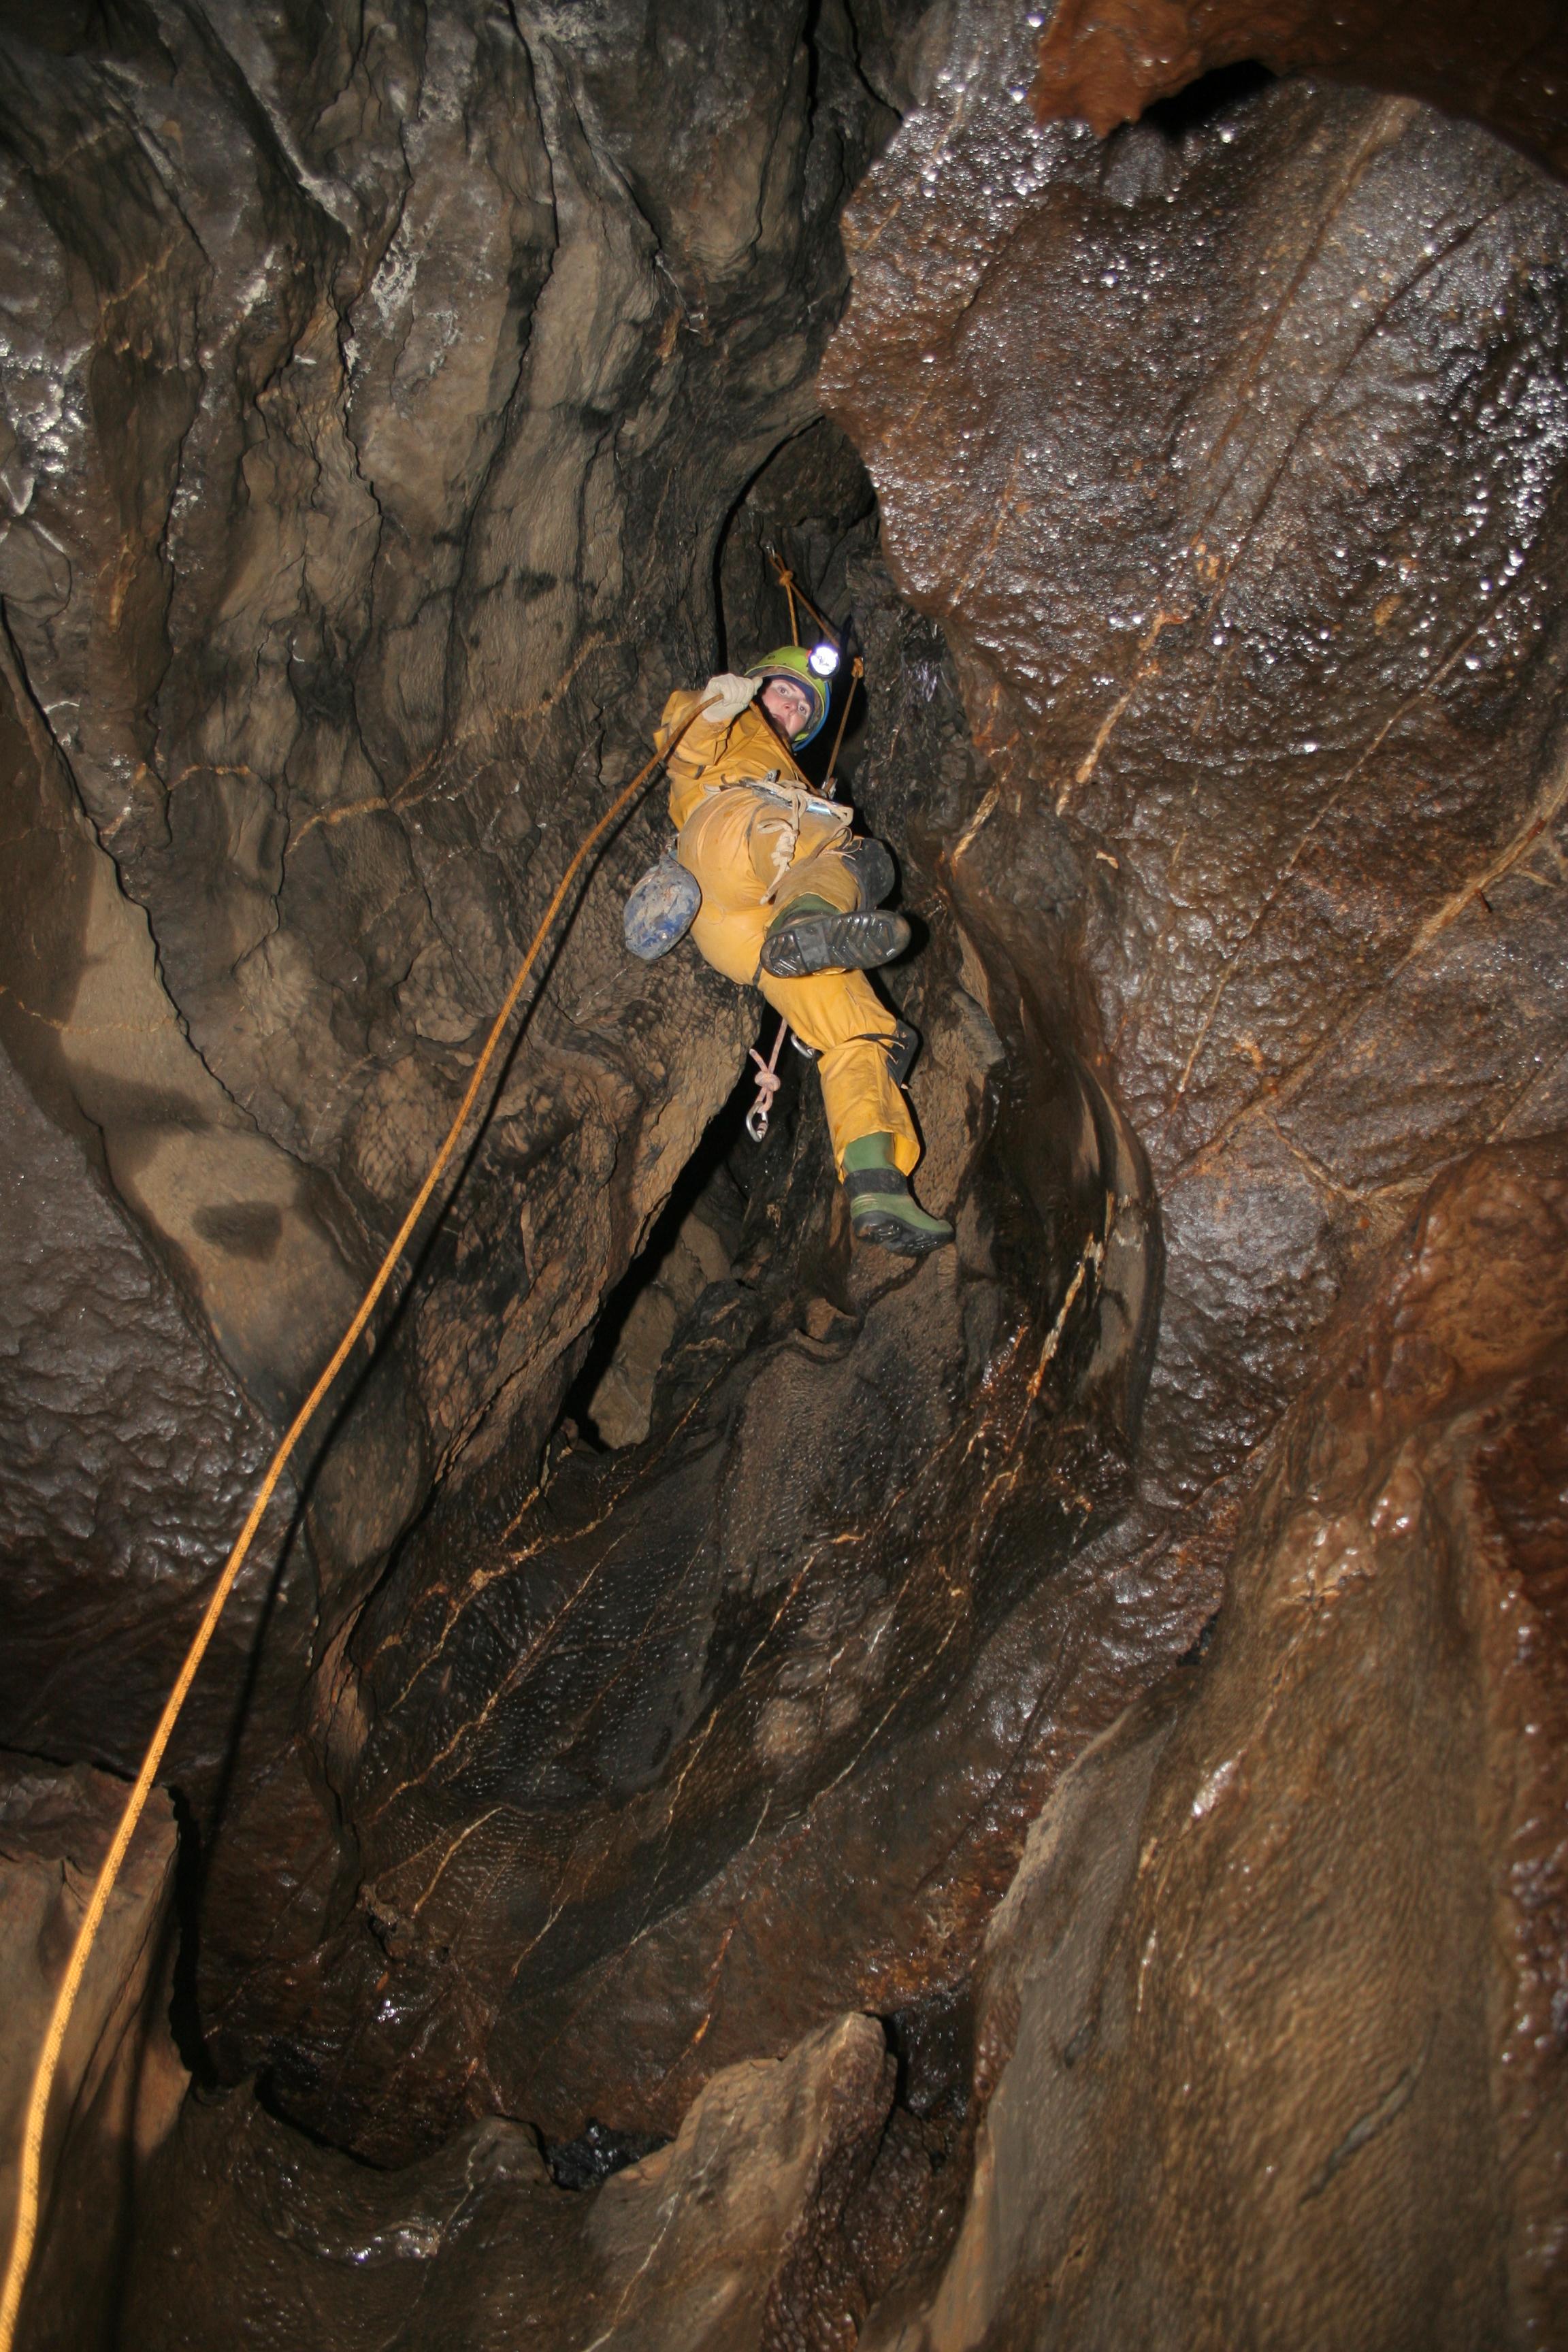 Caving SRT in Notts Pot, Derbyshire